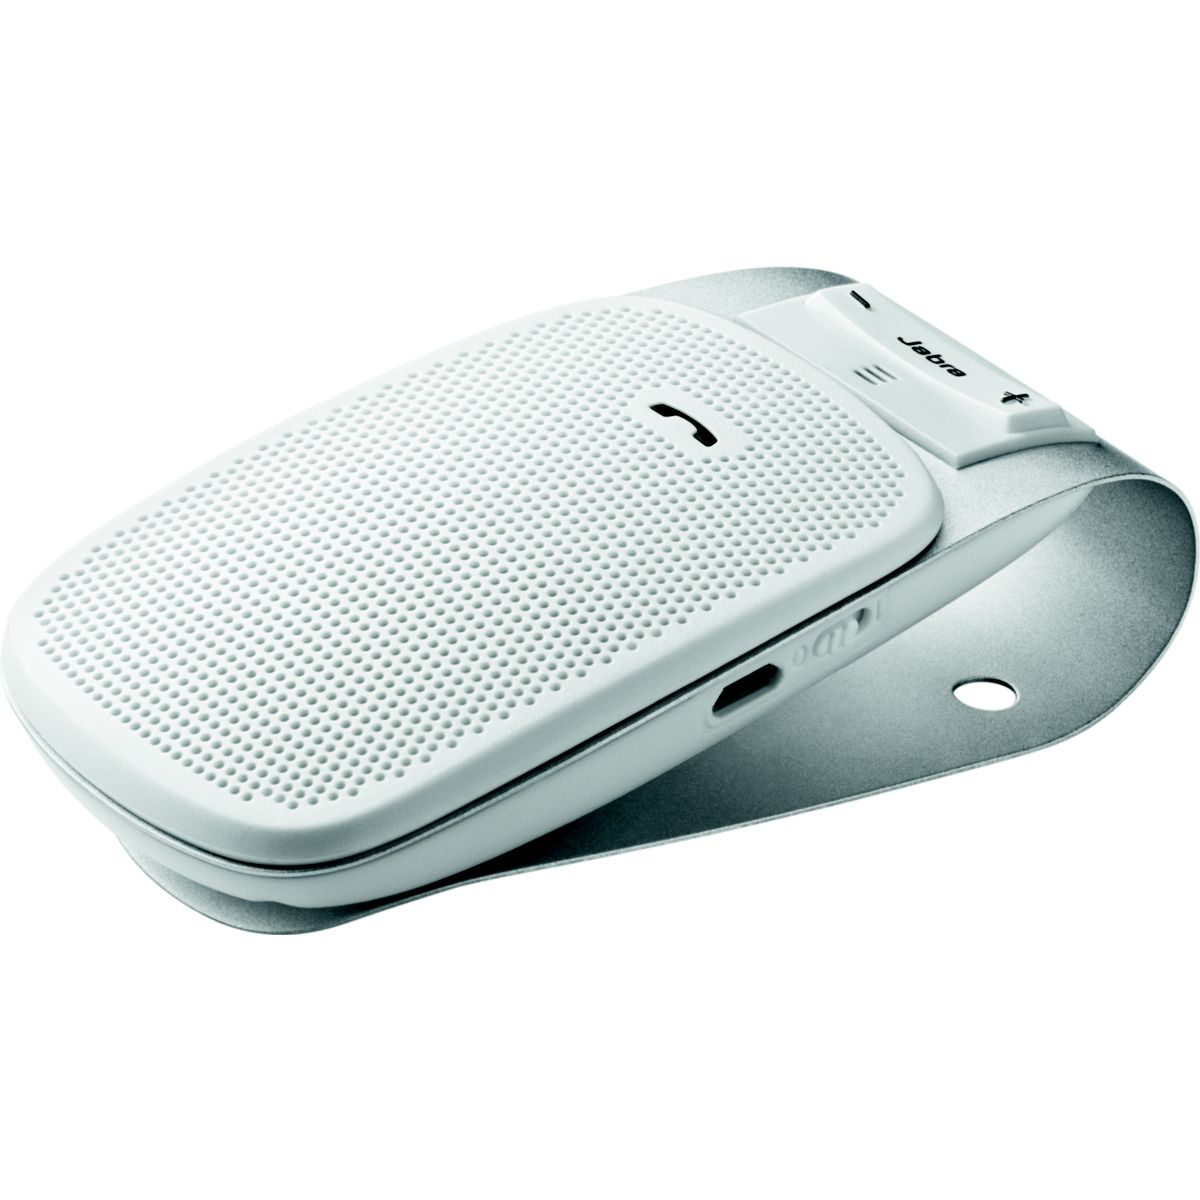 Kit mains libres voiture jabra drive blanc - livraison offerte : code premium (photo)